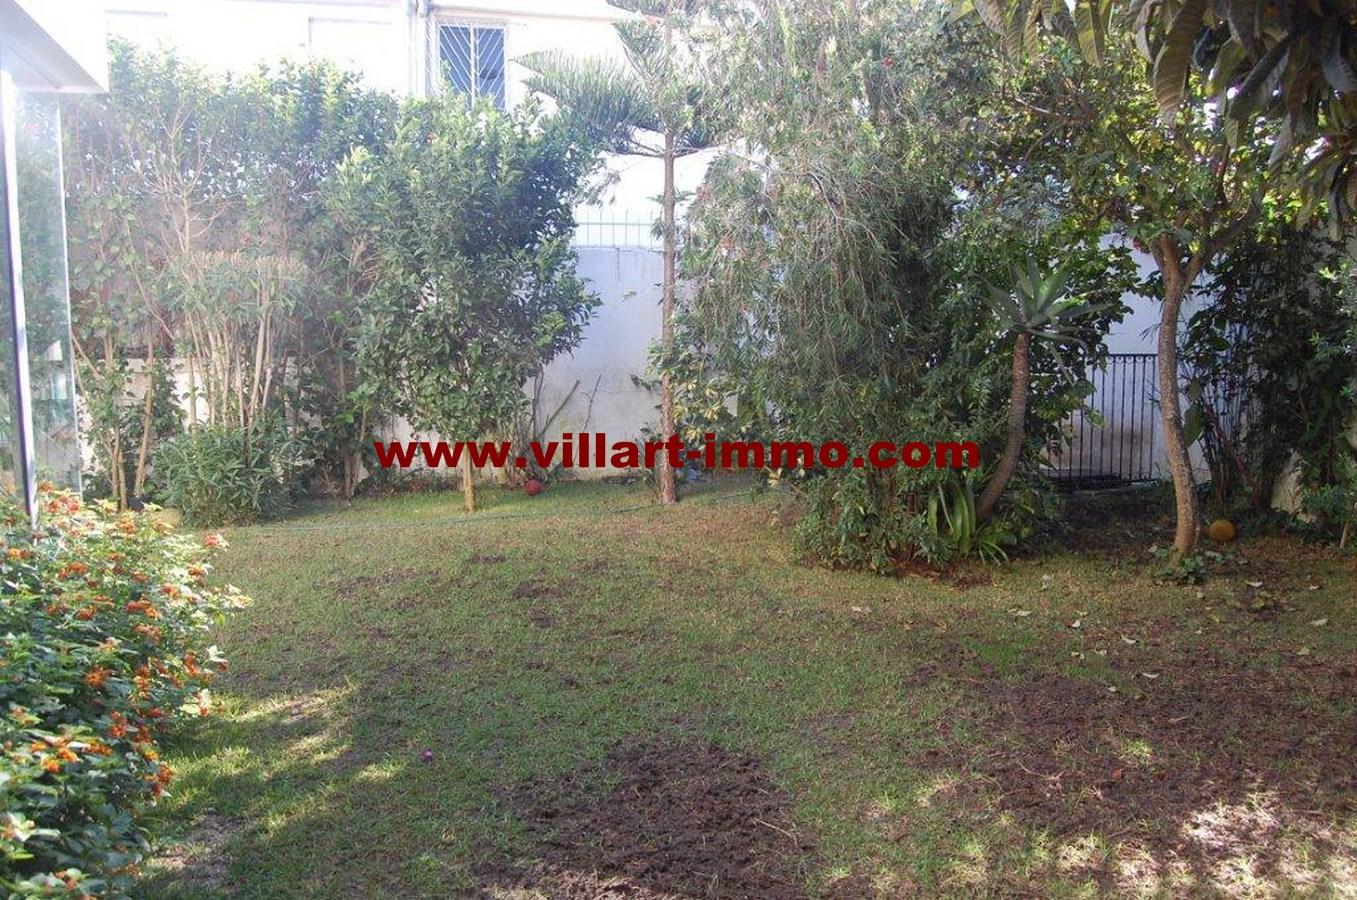 1-a-vendre-tanger-villa-californie-jardin-1-vv461-villart-immo-agence-immobiliere-copier